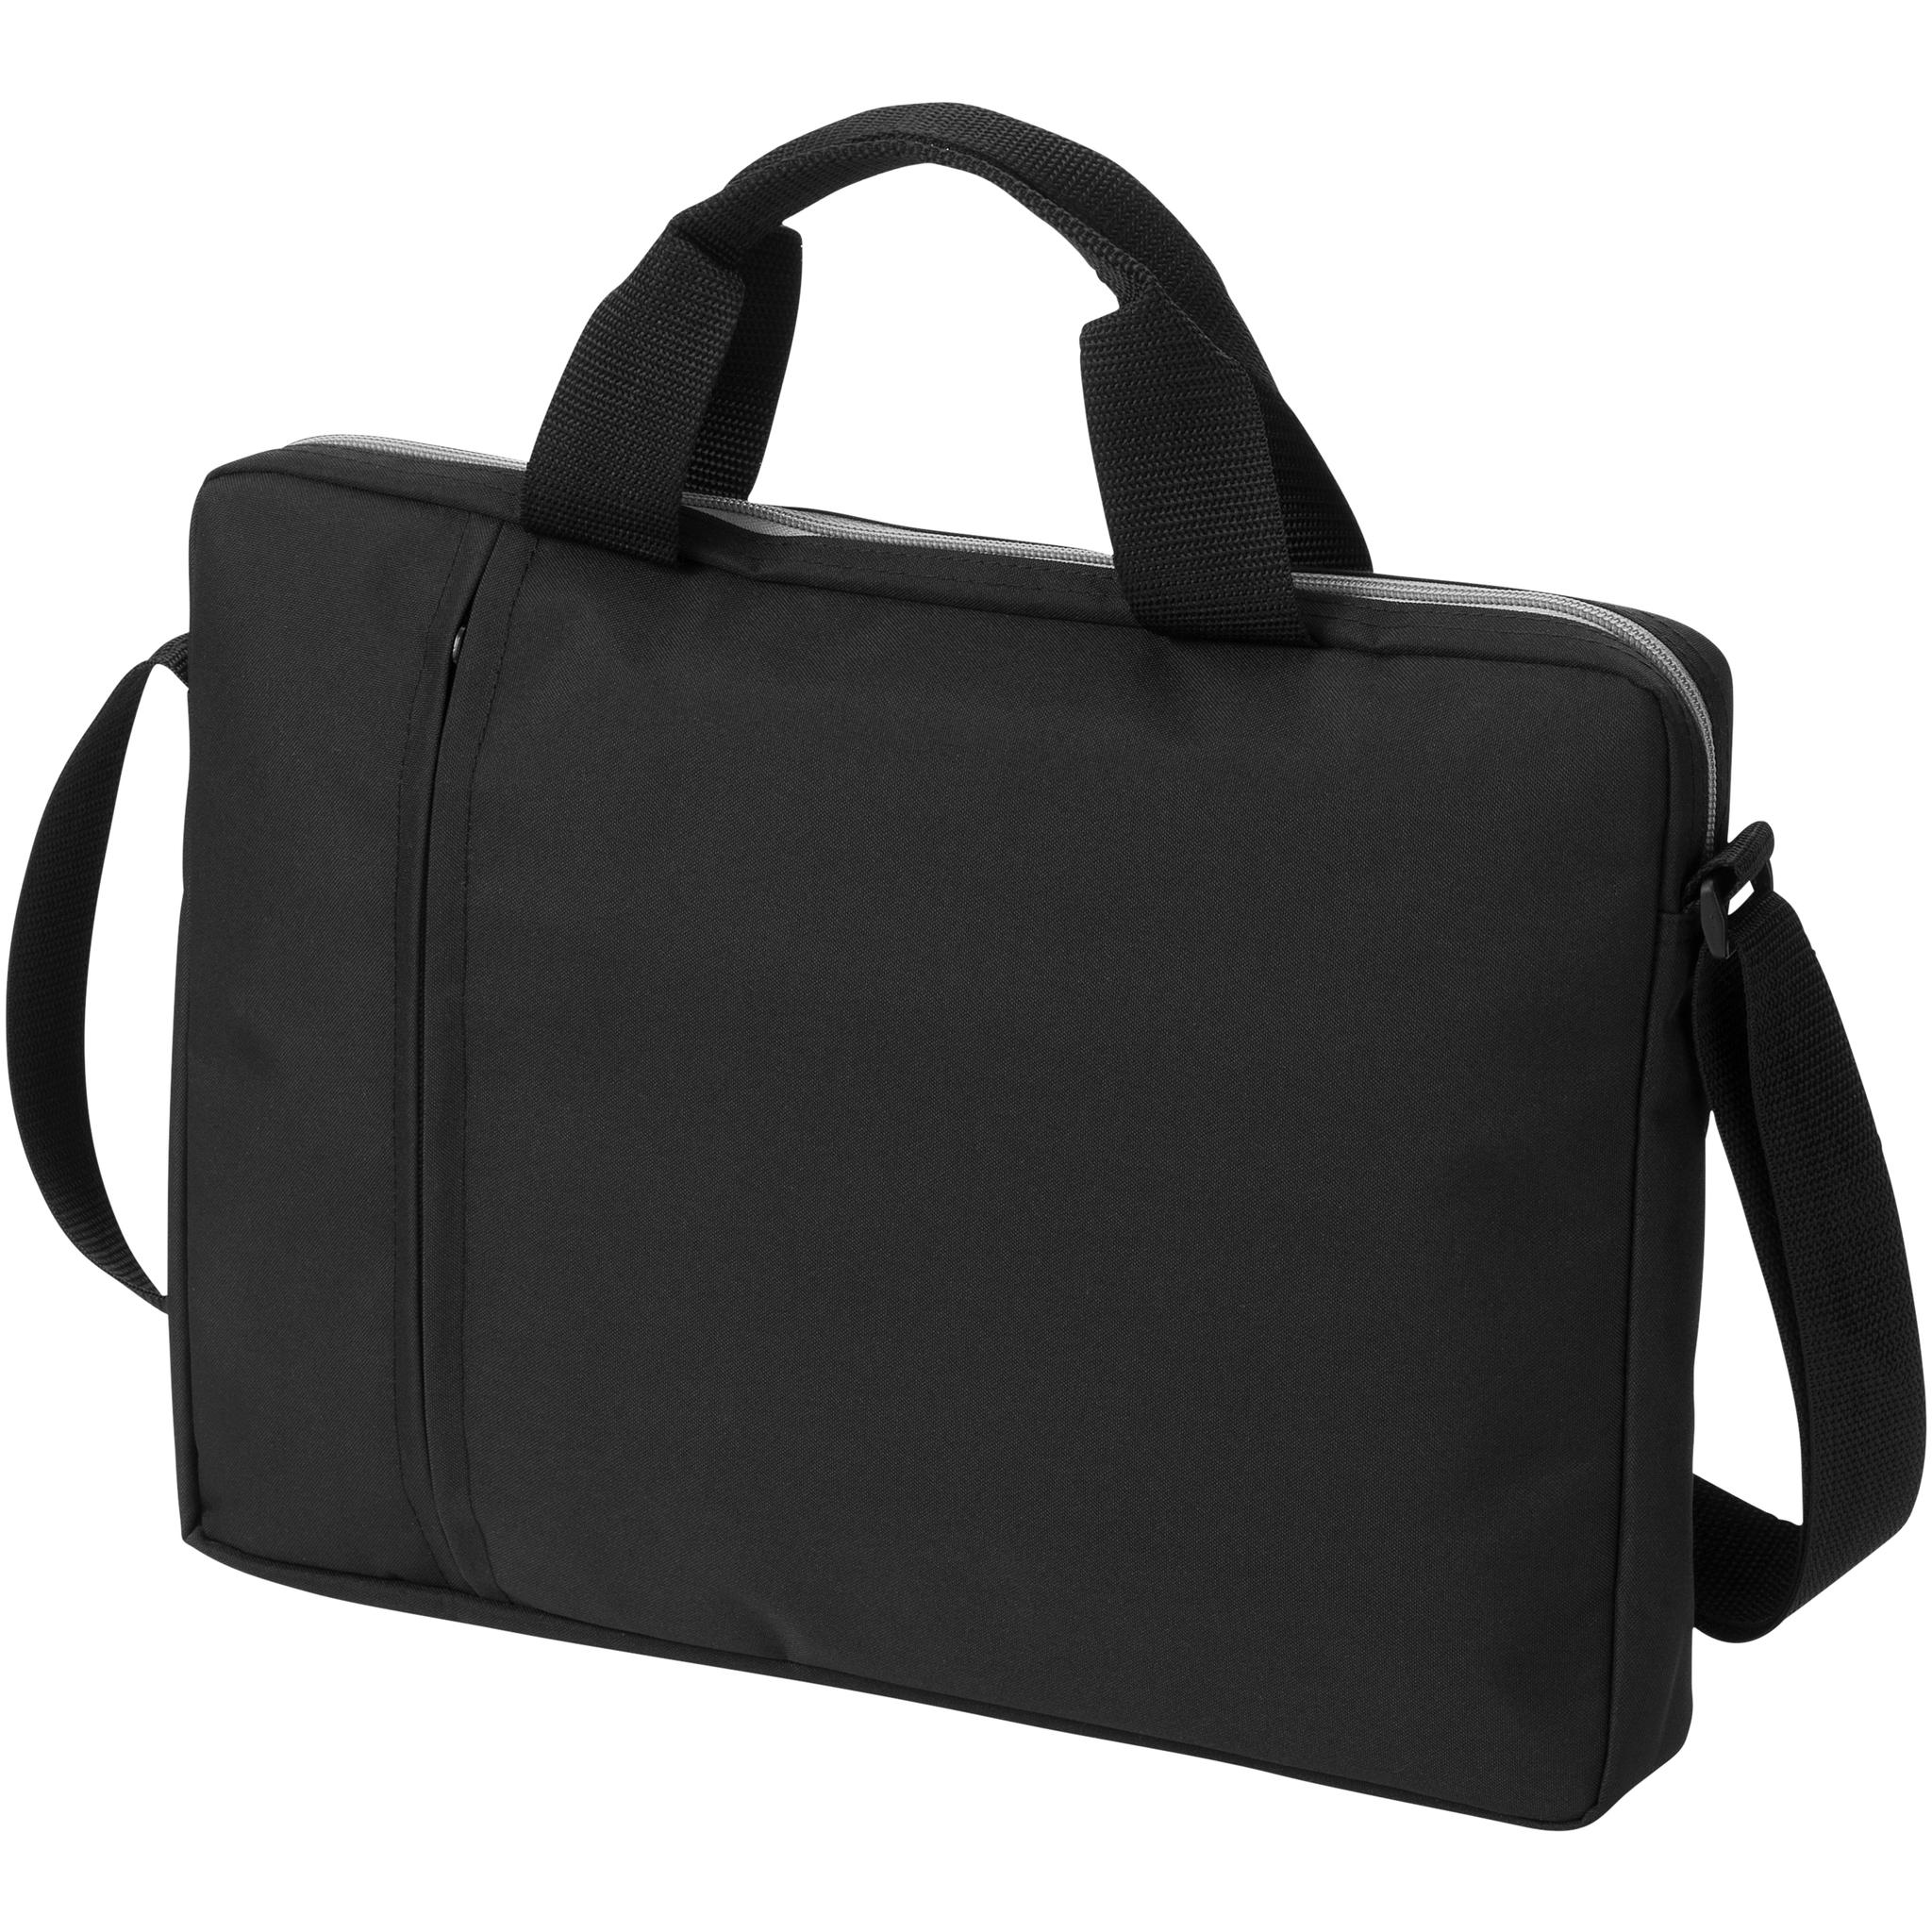 Promotional Tulsa 14'' laptop conference bag